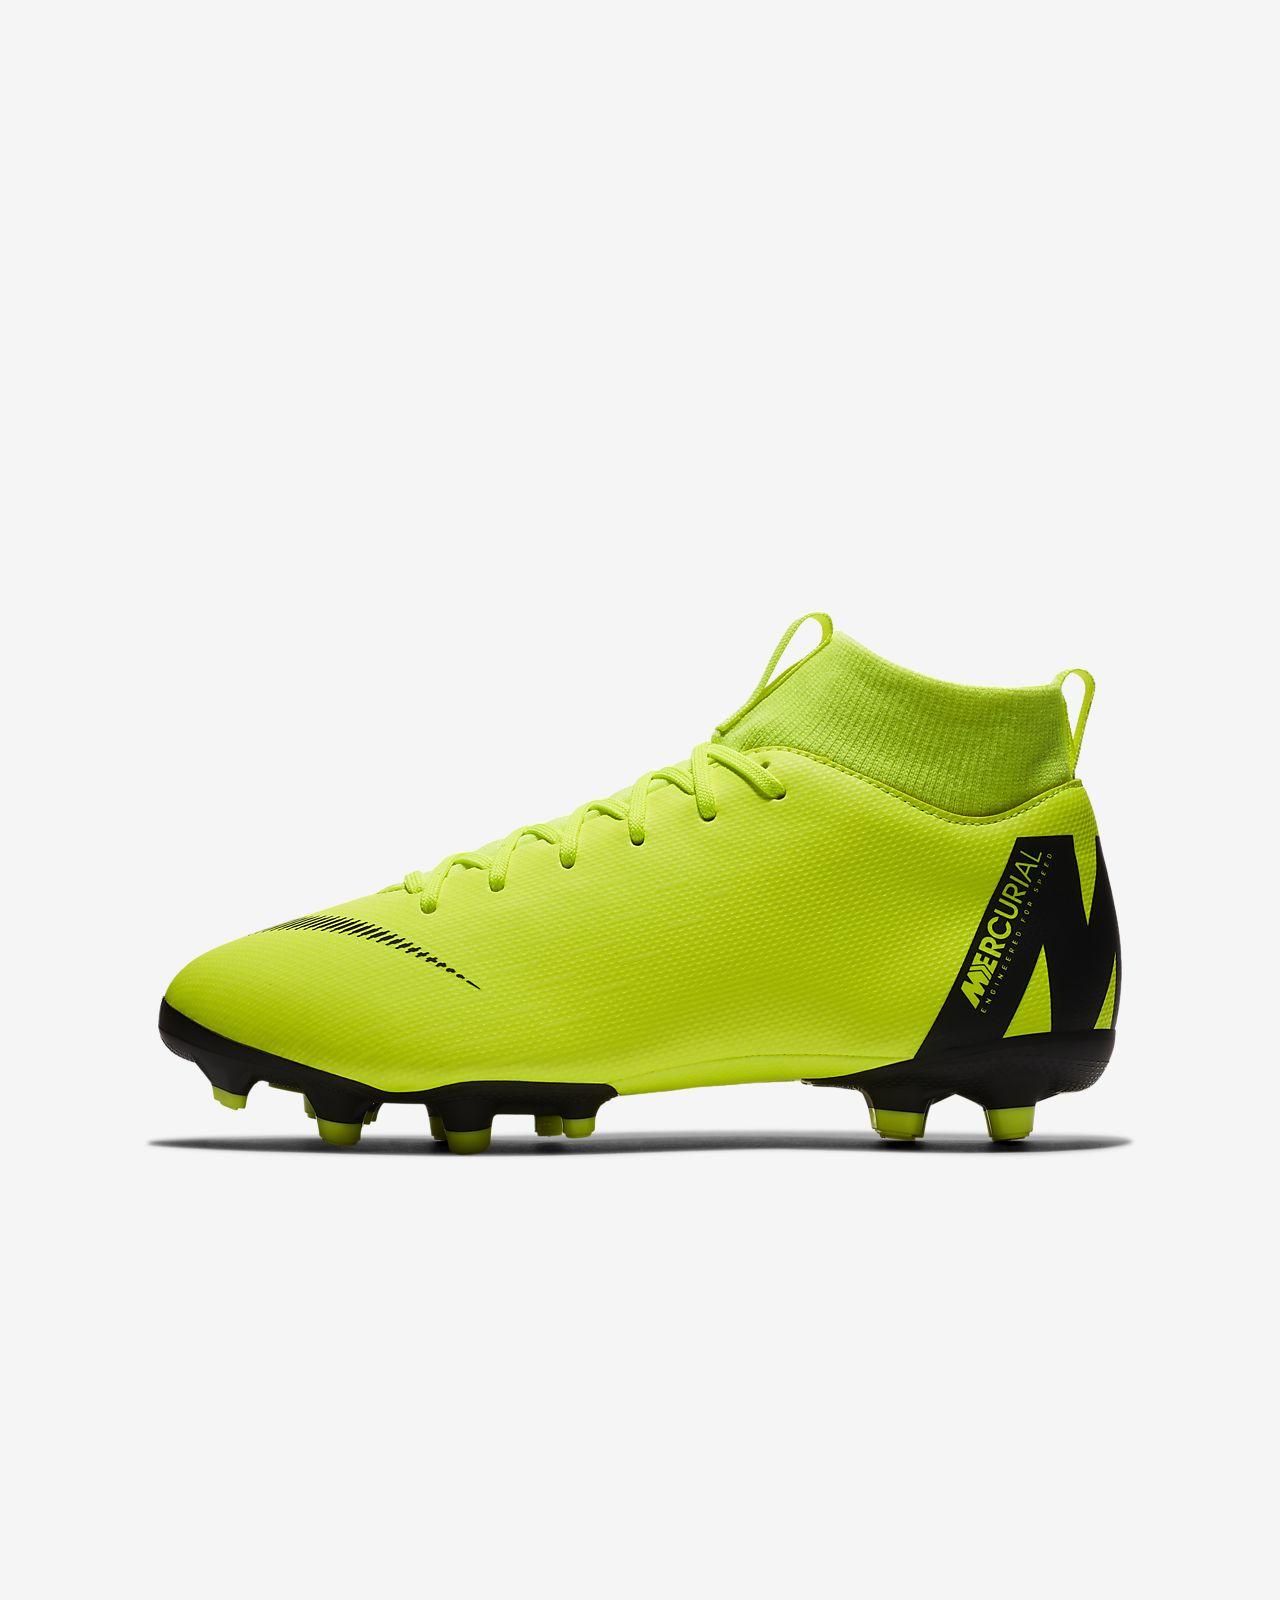 Nike Jr. Superfly 6 Academy MG Botas de fútbol para múltiples superficies -  Niño  3a19ff71e59f5